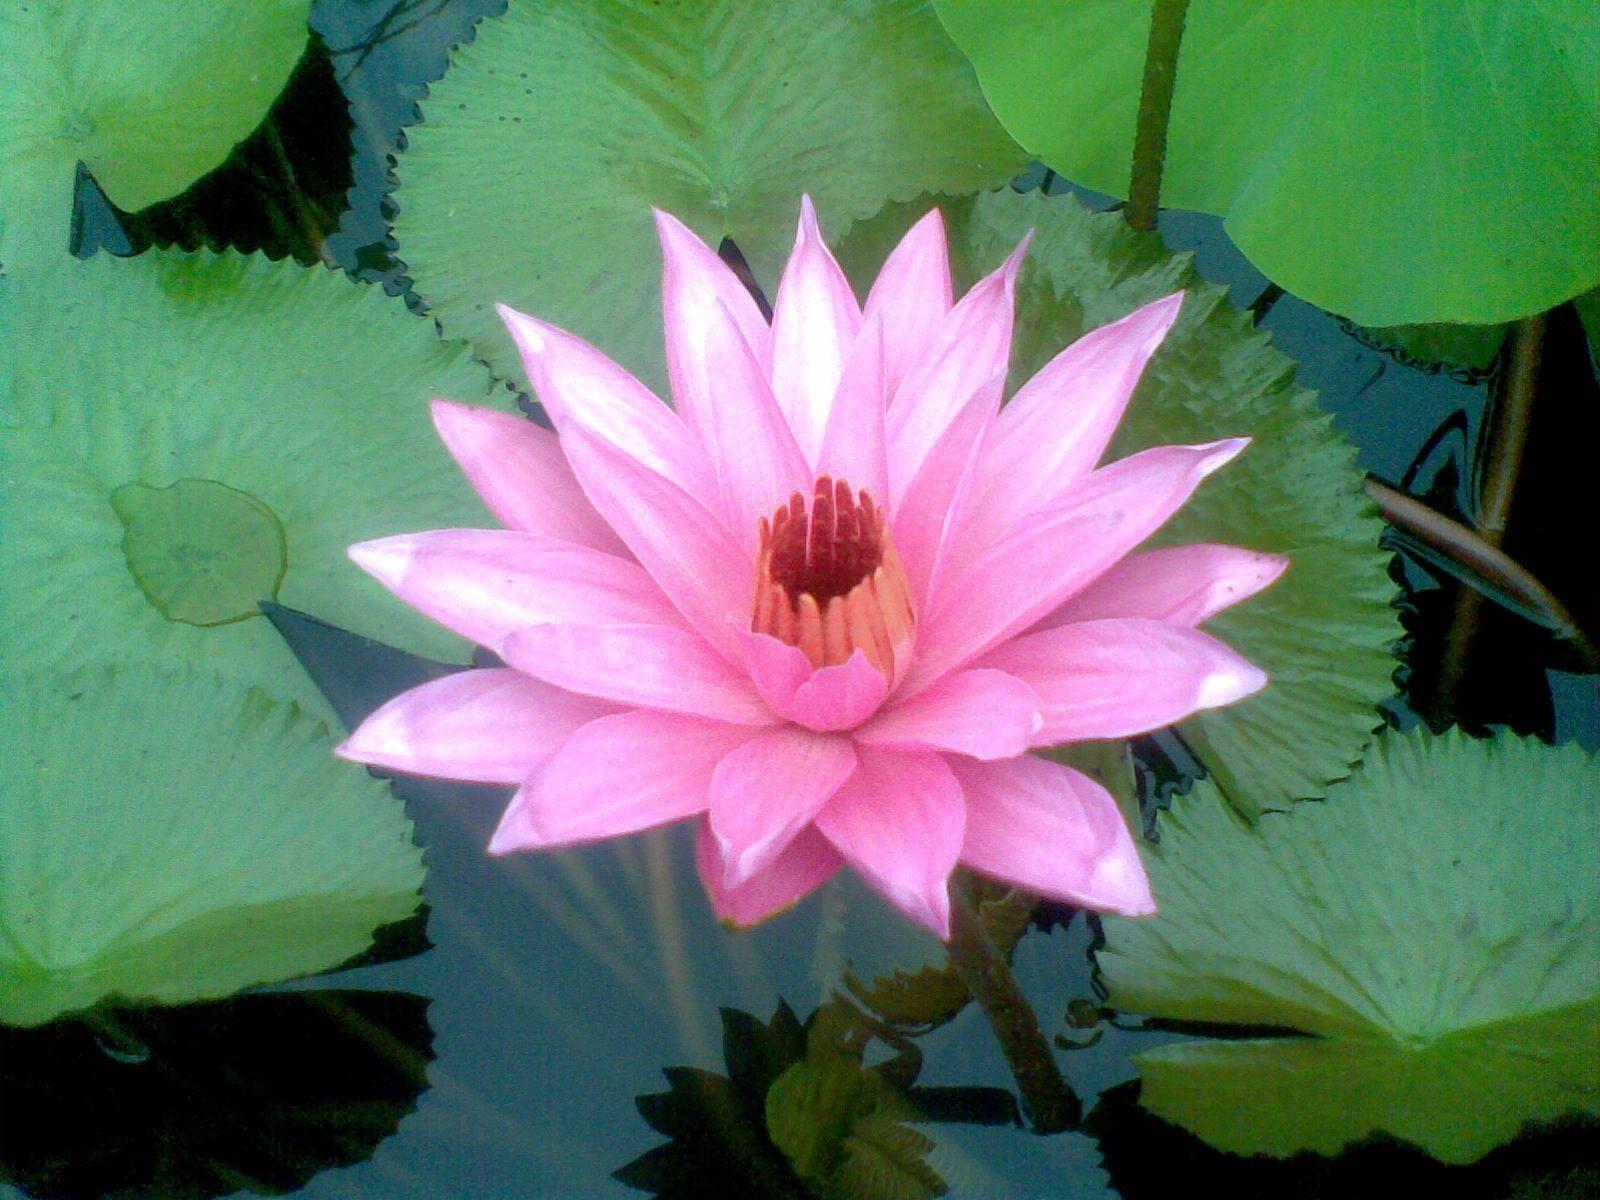 Bunga Teratai Bunga Gambar Bunga